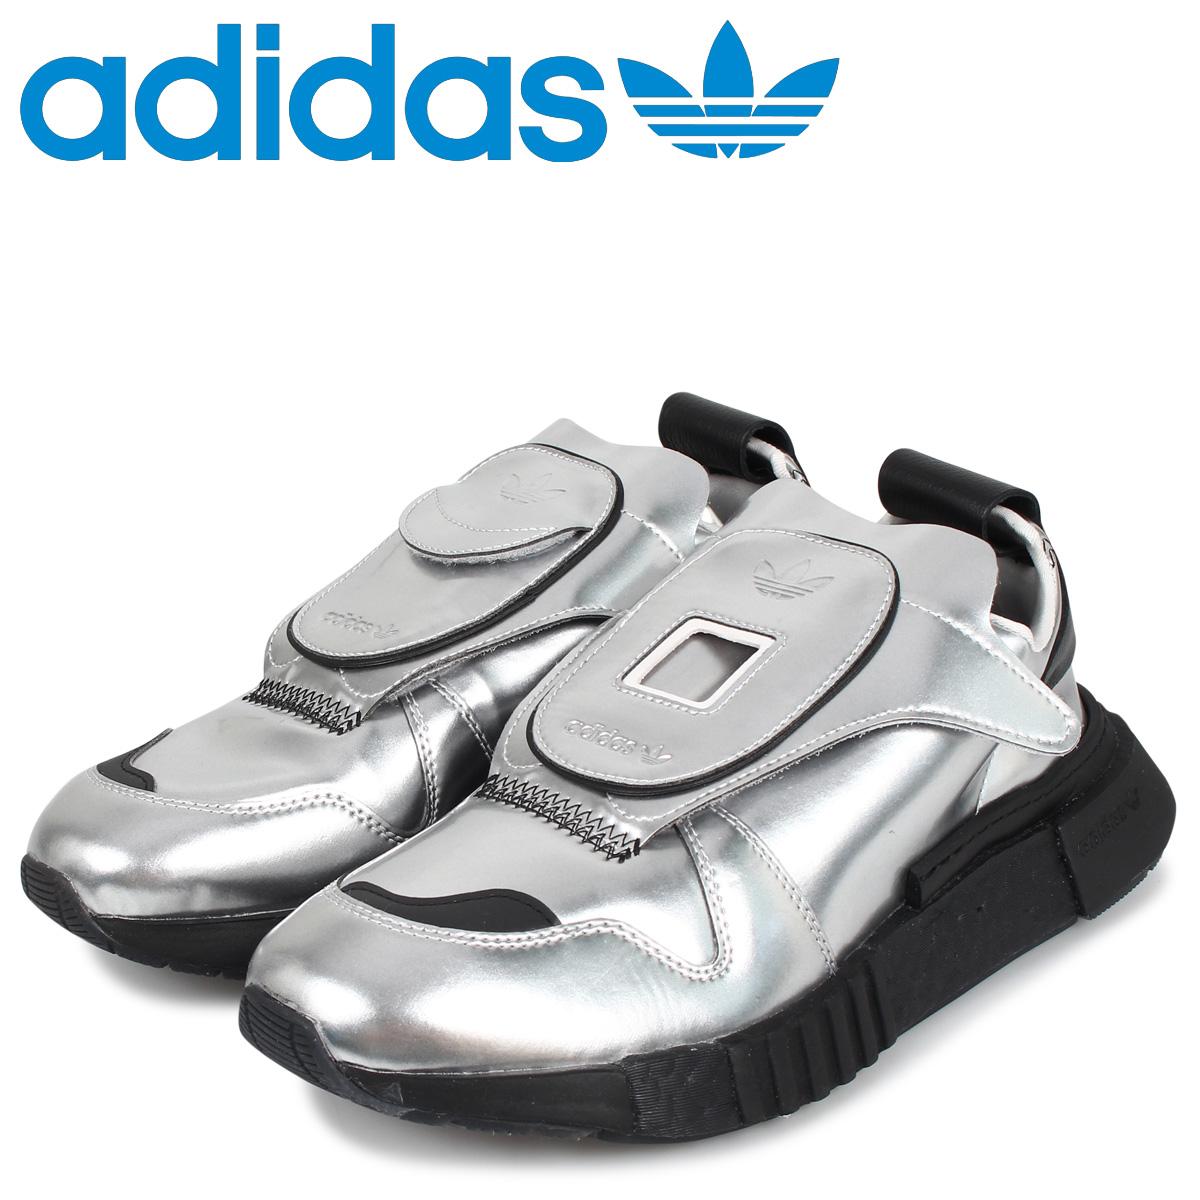 adidas Originals アディダス オリジナルス フューチャーペーサー スニーカー メンズ FUTURPACER シルバー EE5002